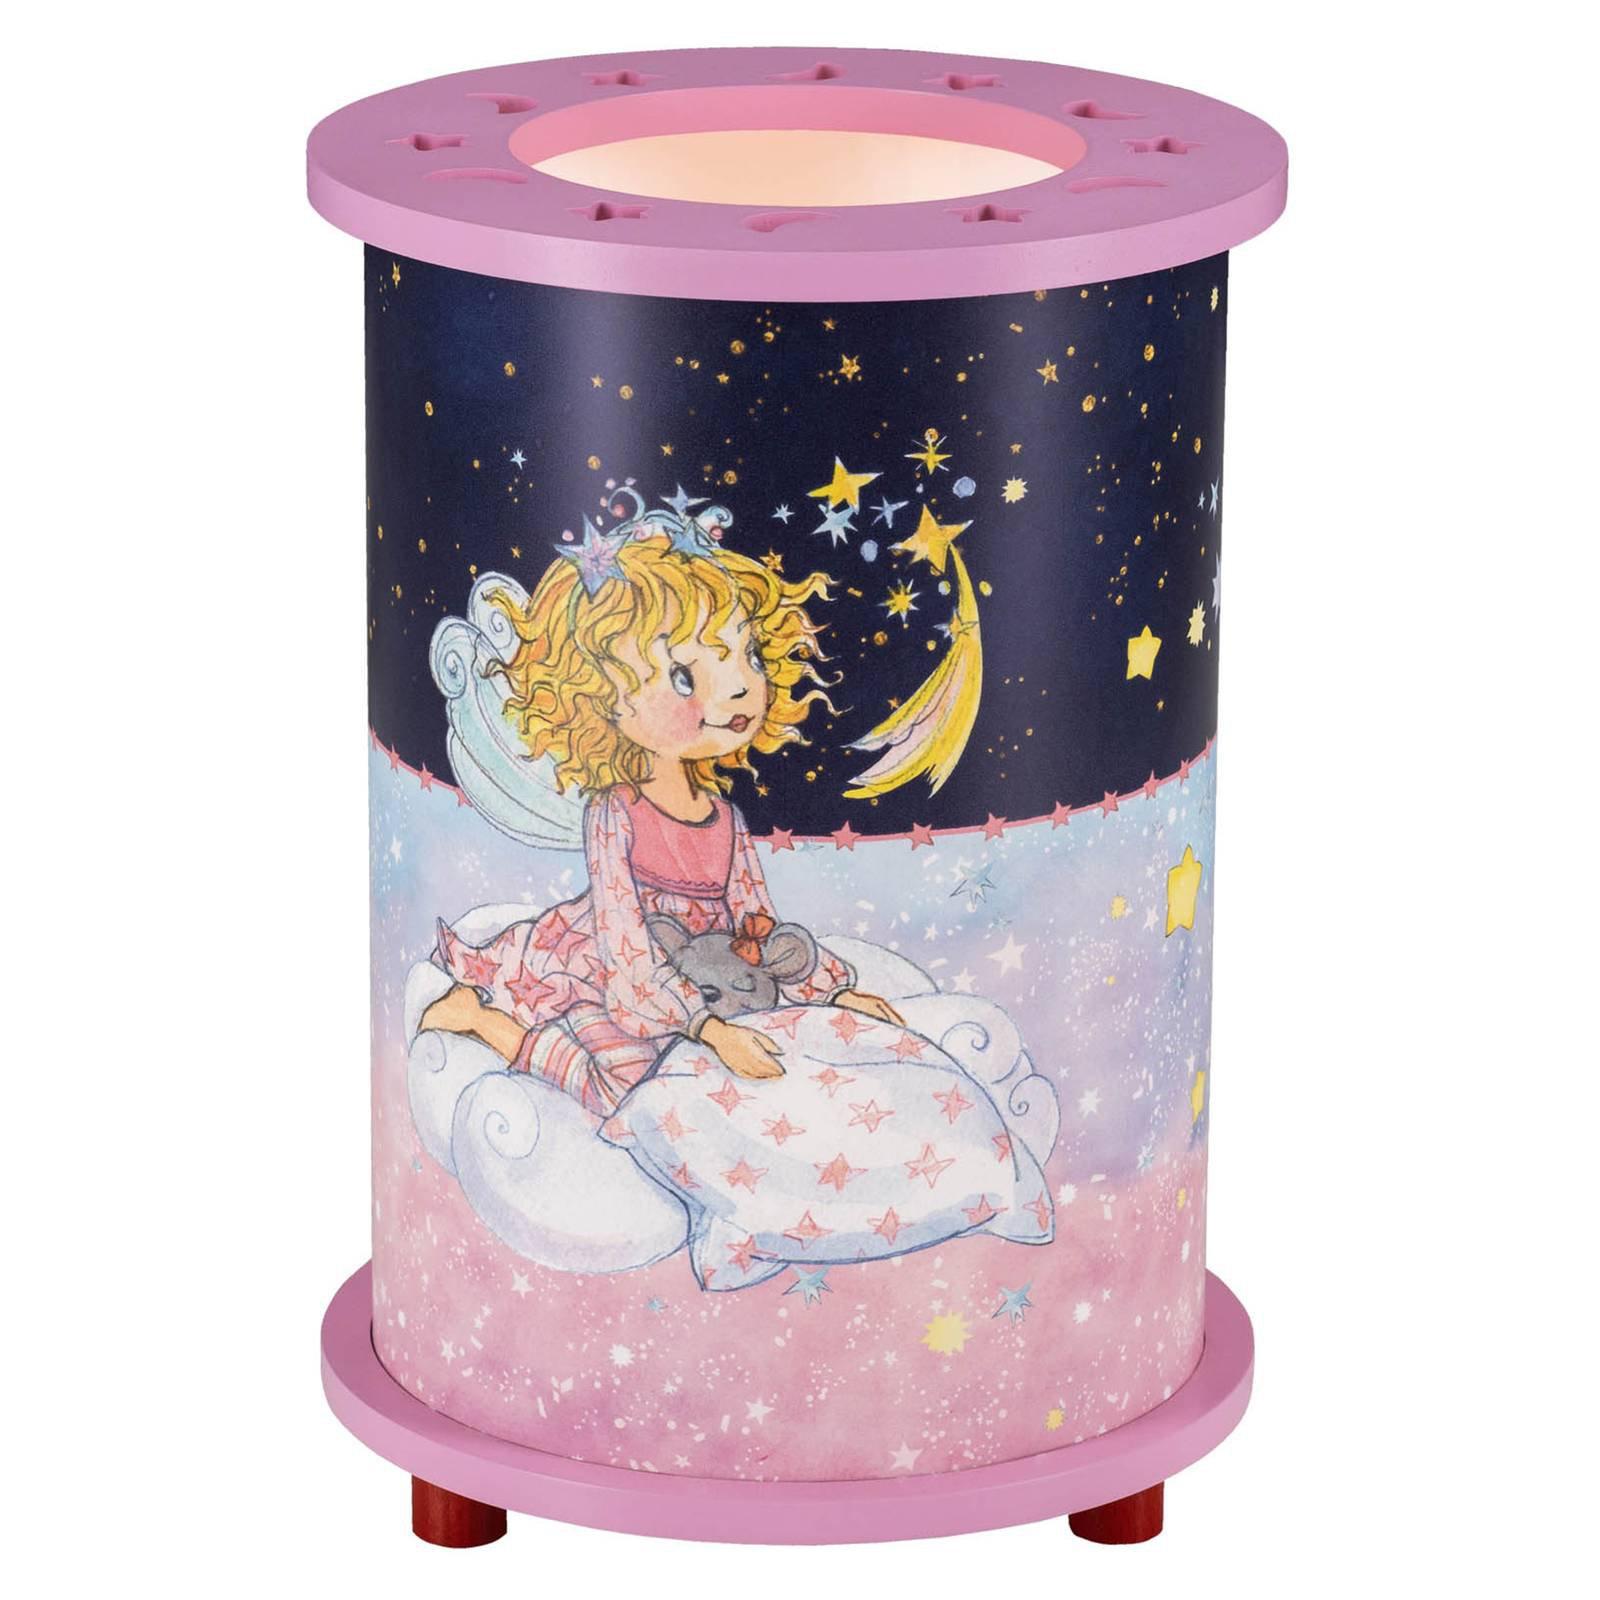 Bordlampe Prinsesse Lillifee, stjerner